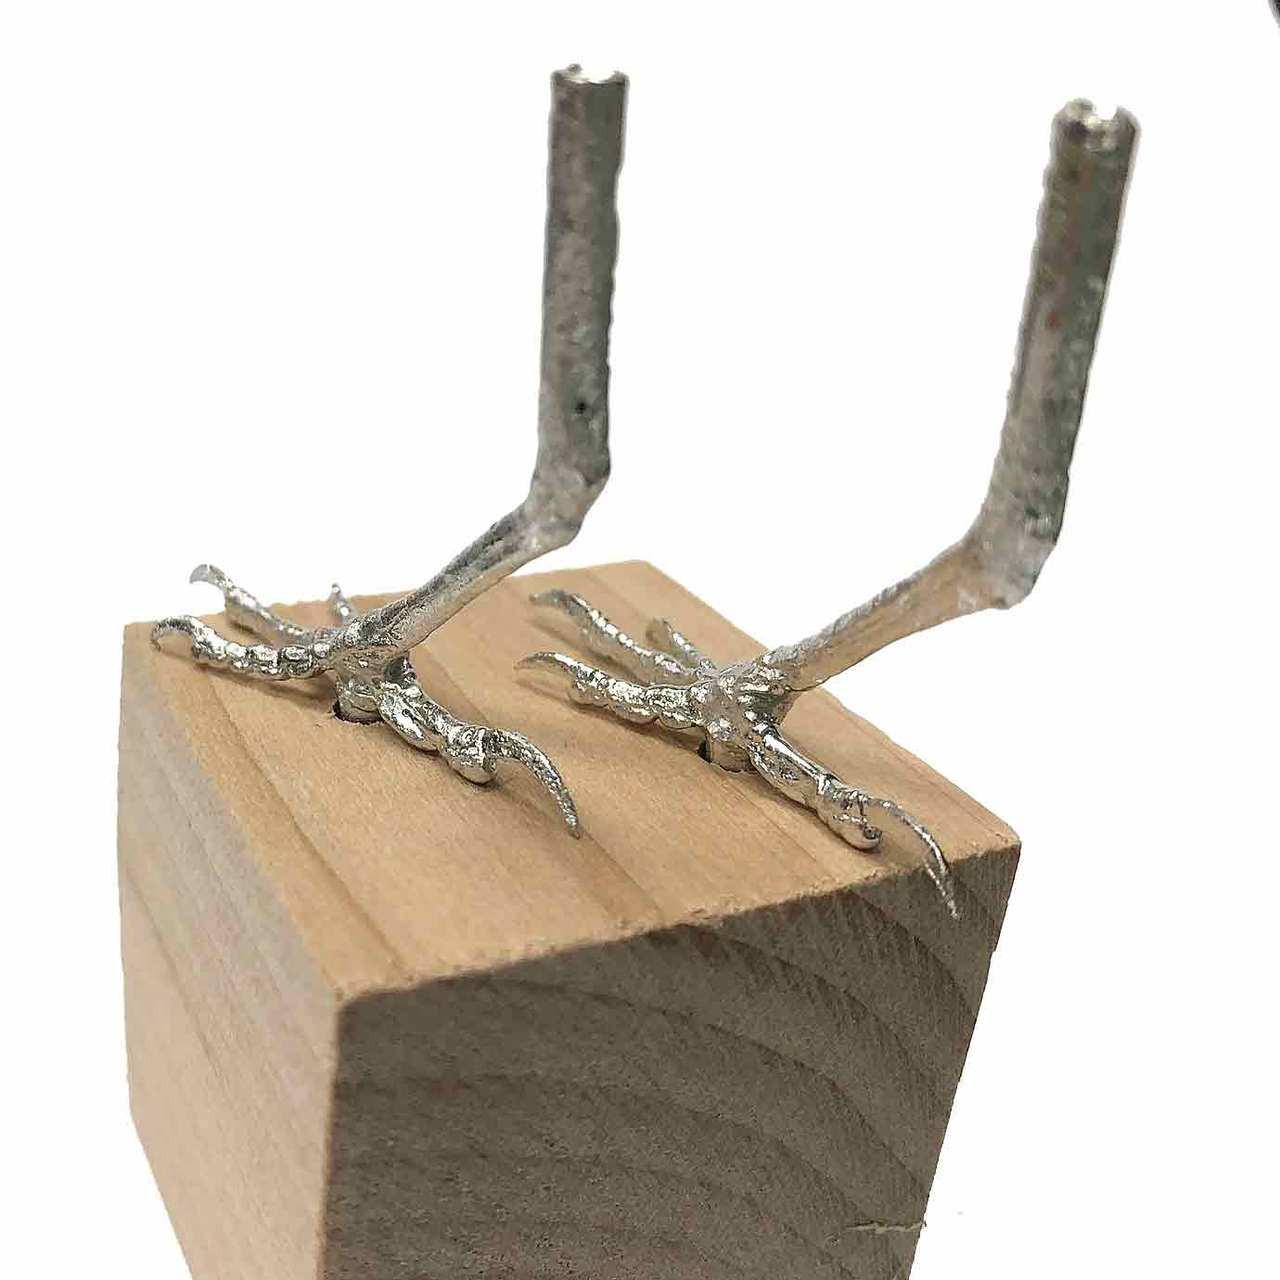 Rear view of the cedar waxwing feet.